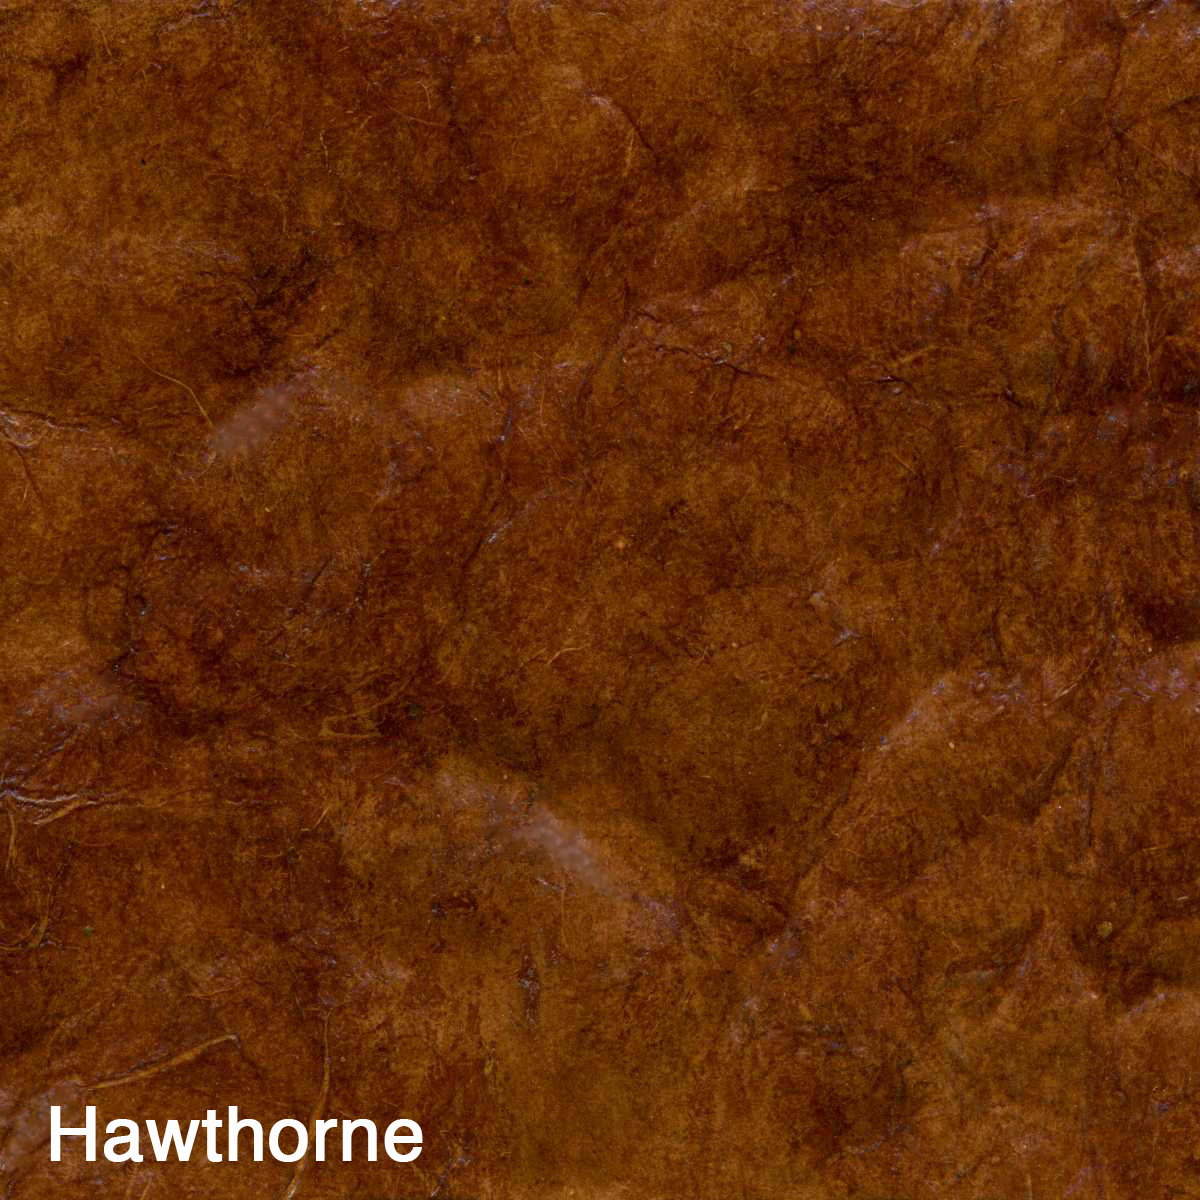 Hawthorne copy copy.jpg